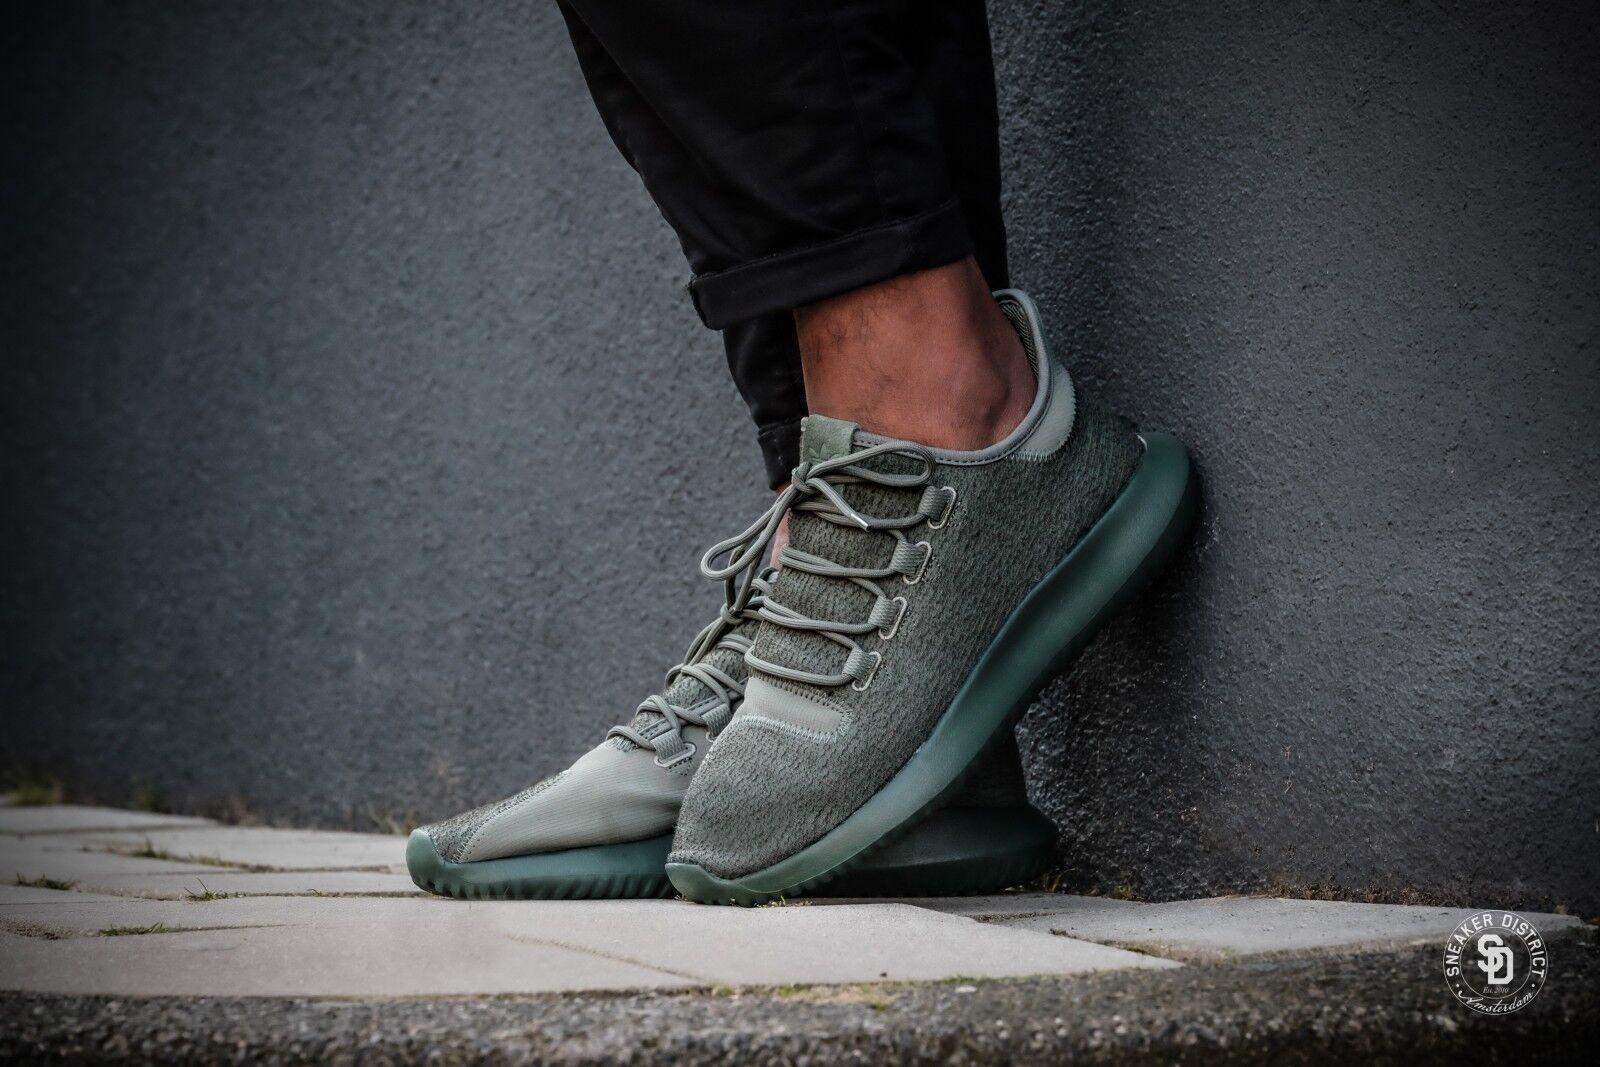 Adidas Tubular Shadow Men's Running Shoes BY3573